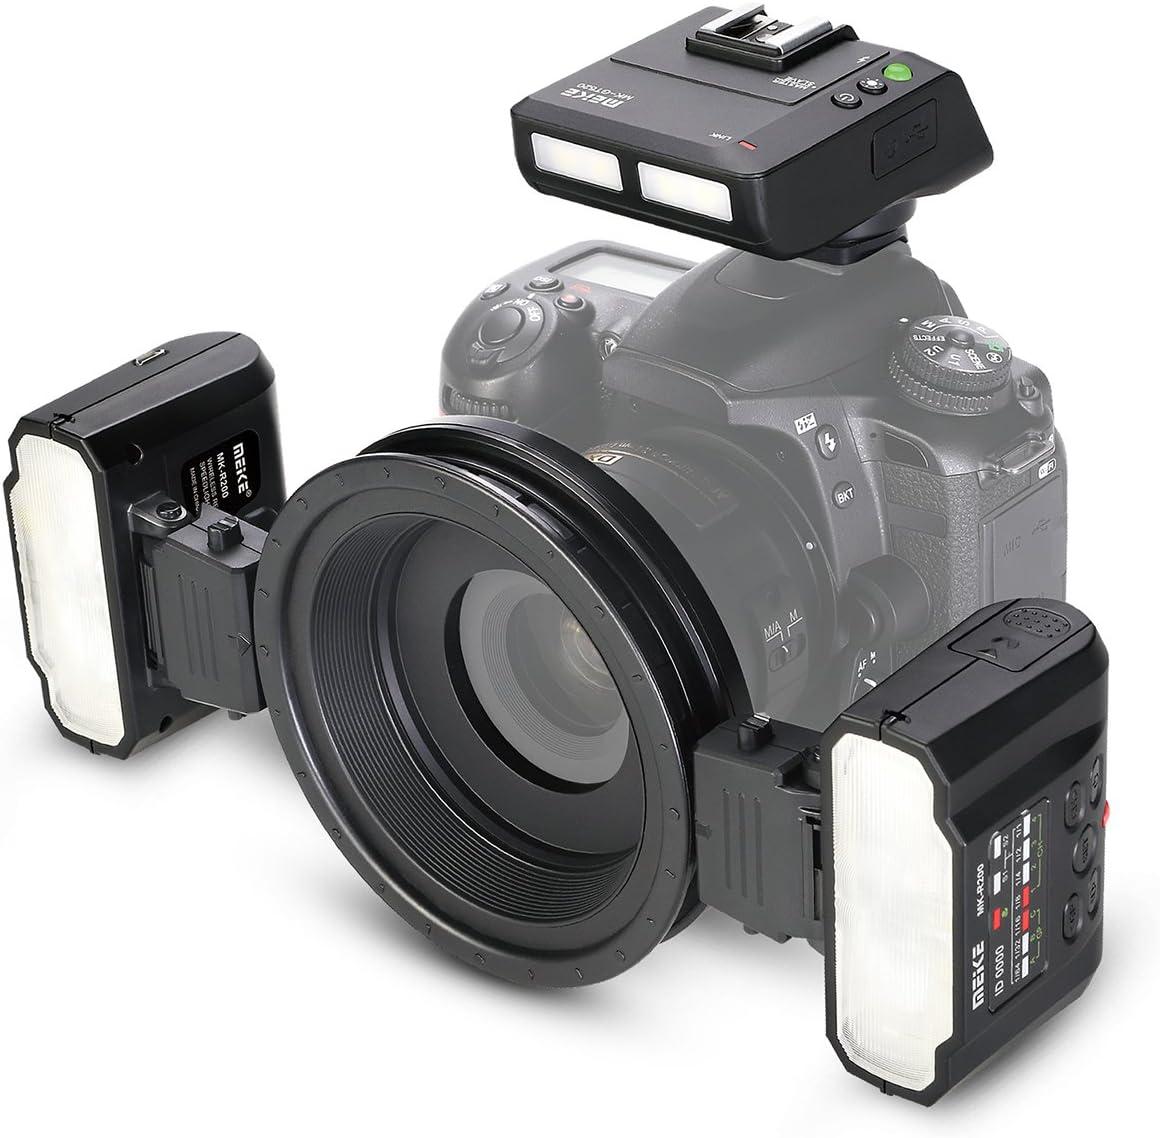 Amazon.com : Meike MK-MT24 2.4G Wireless Close-Up Speedlight Macro Twin  Lite Flash for Nikon F-Mount Z-Mount Digital<help data-id='78'><a href='/Dic/78/SLR' target='_blank'><strong>SLR</strong></a></help>Cameras D1X D2 D2H D2X D3  D3X D200 D300 D300S D700 Z6 Z7, etc :